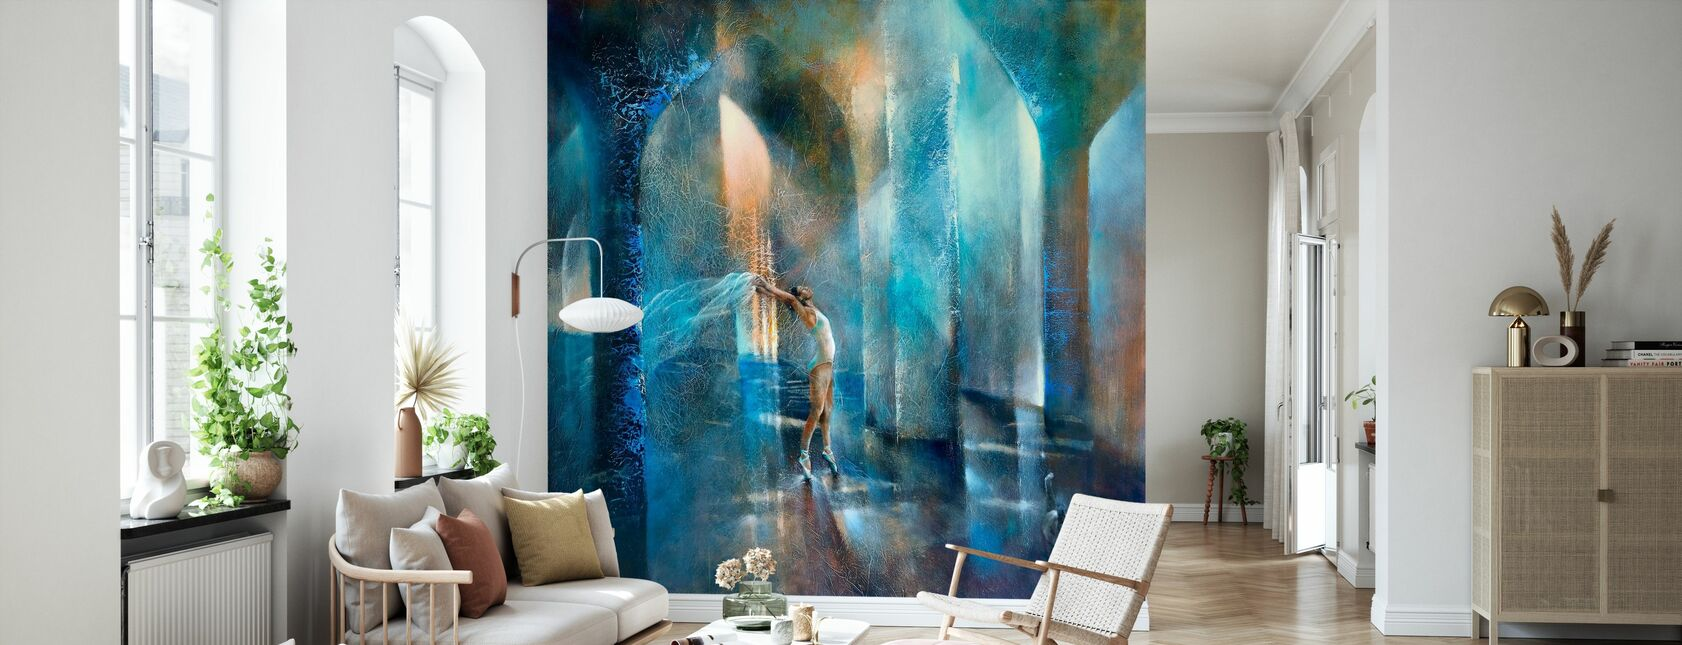 Cat and Dancer - Wallpaper - Living Room